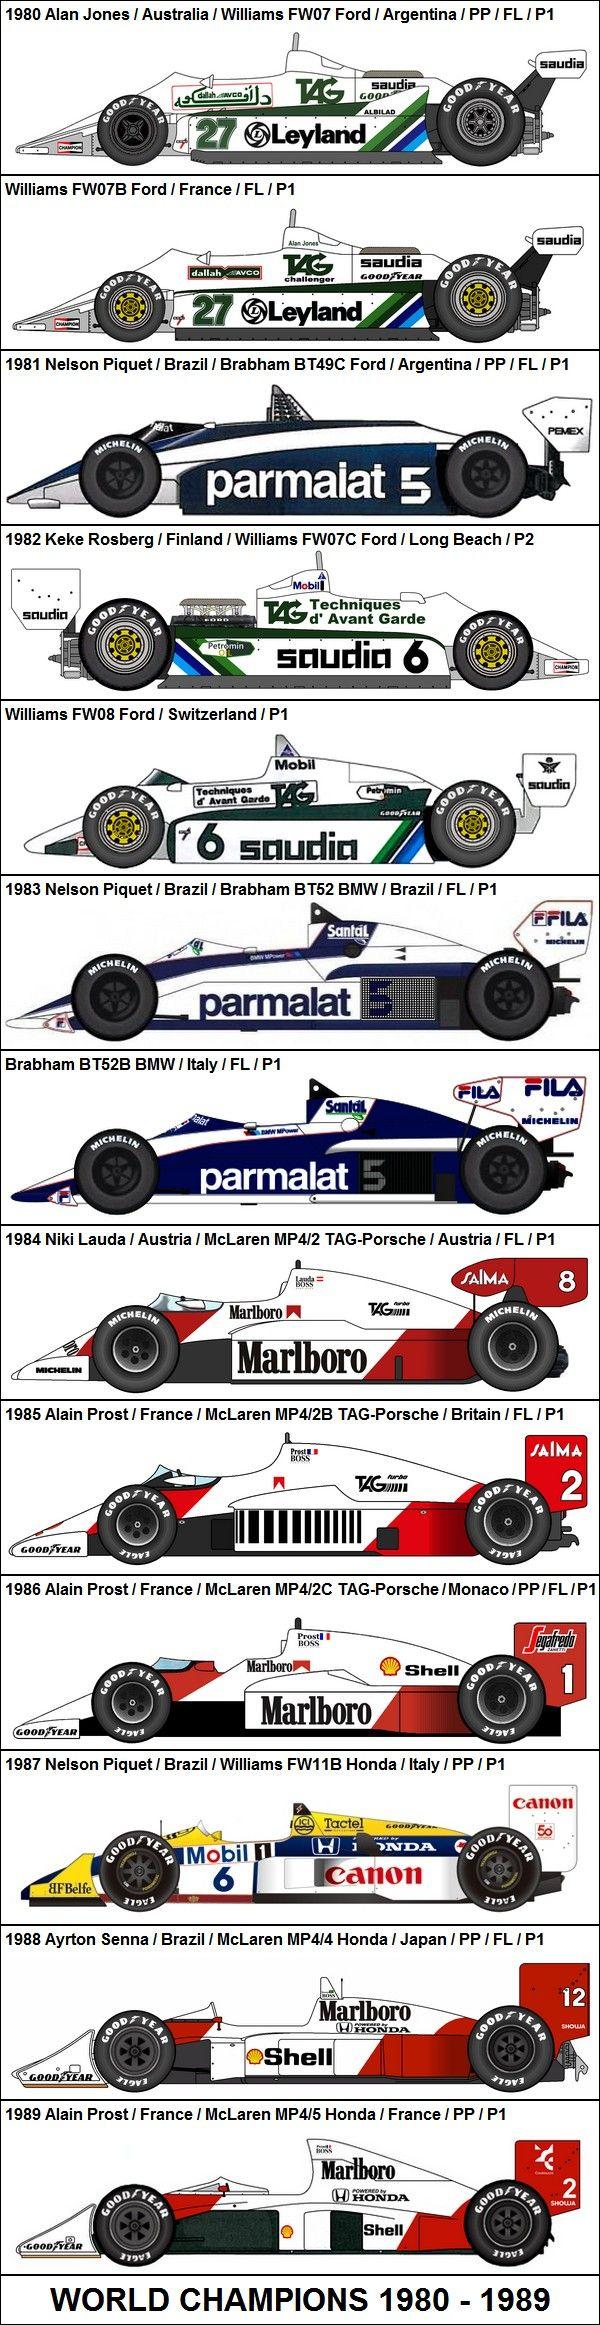 Formula One Grand Prix World Champions 1980-1989